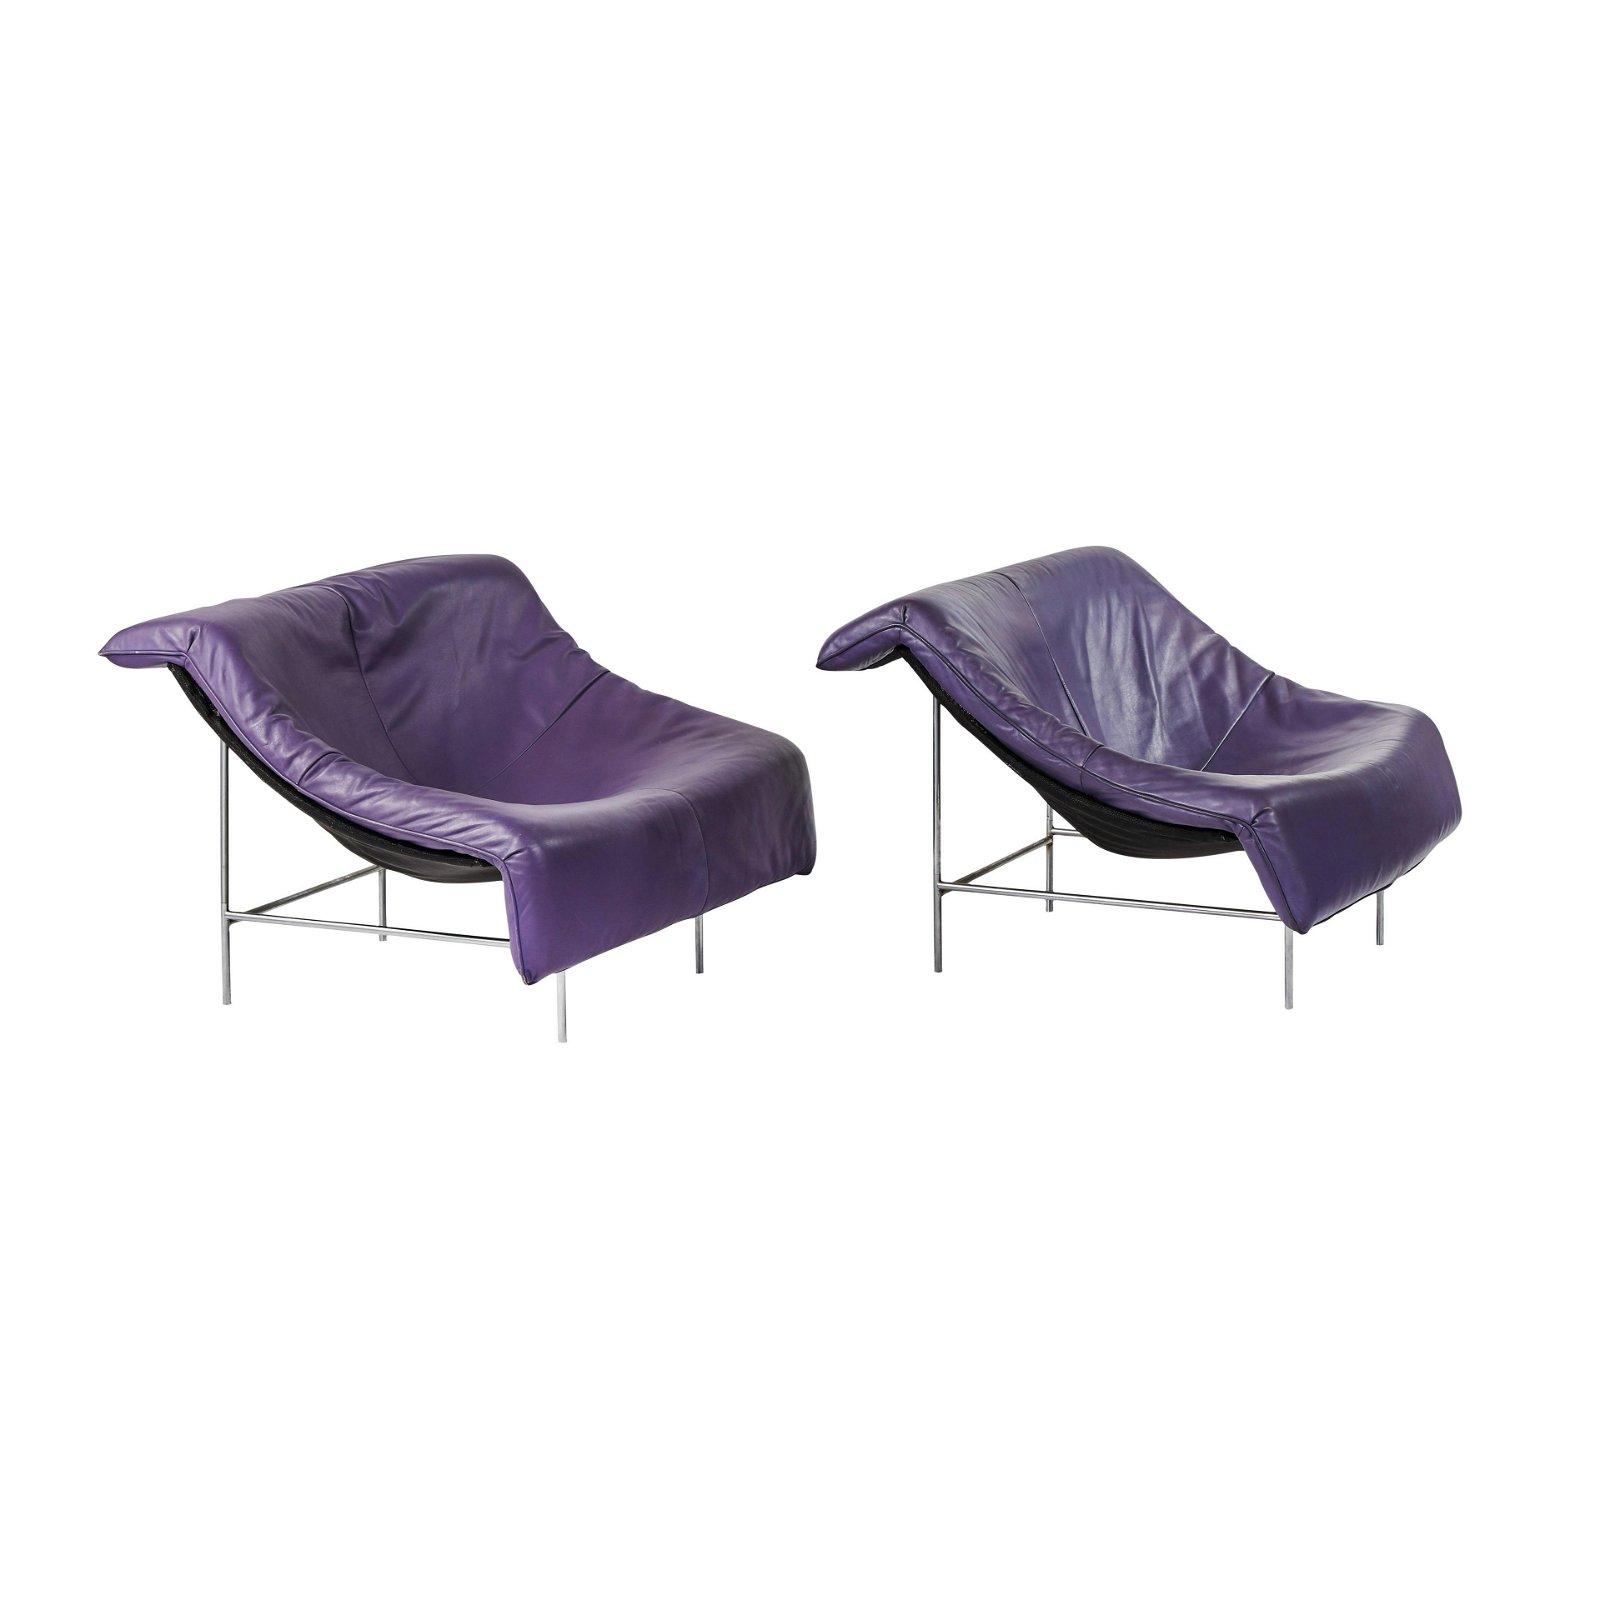 Gerard van den Berg Butterfly Lounge Chairs (2)